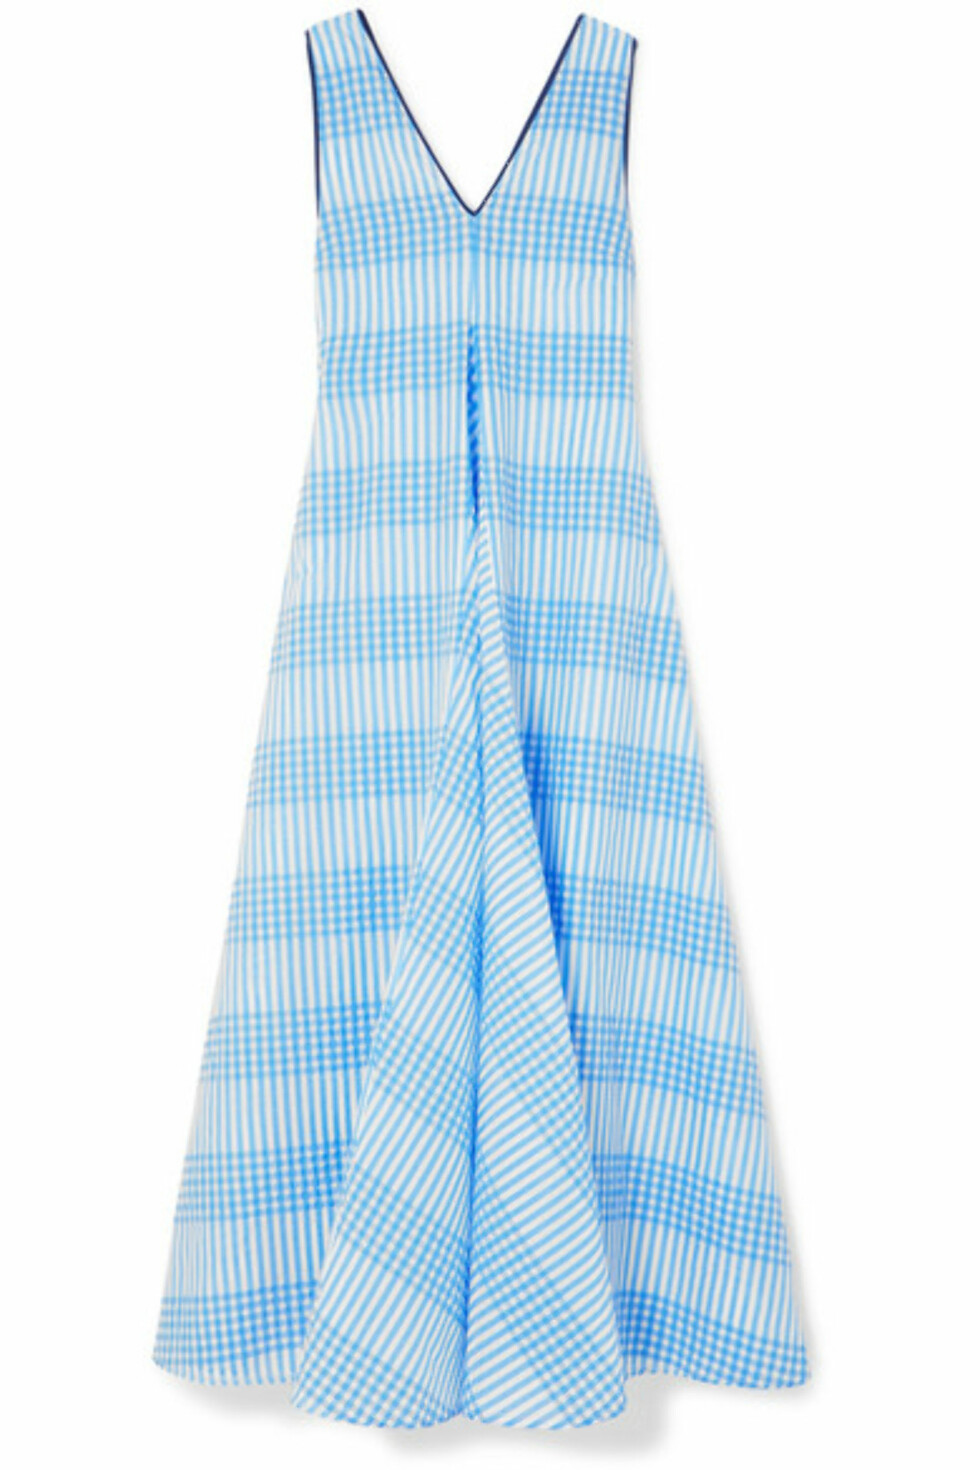 Kjole fra Ganni  2320,-  https://www.net-a-porter.com/no/en/product/1029836/ganni/charron-checked-cotton-blend-seersucker-maxi-dress